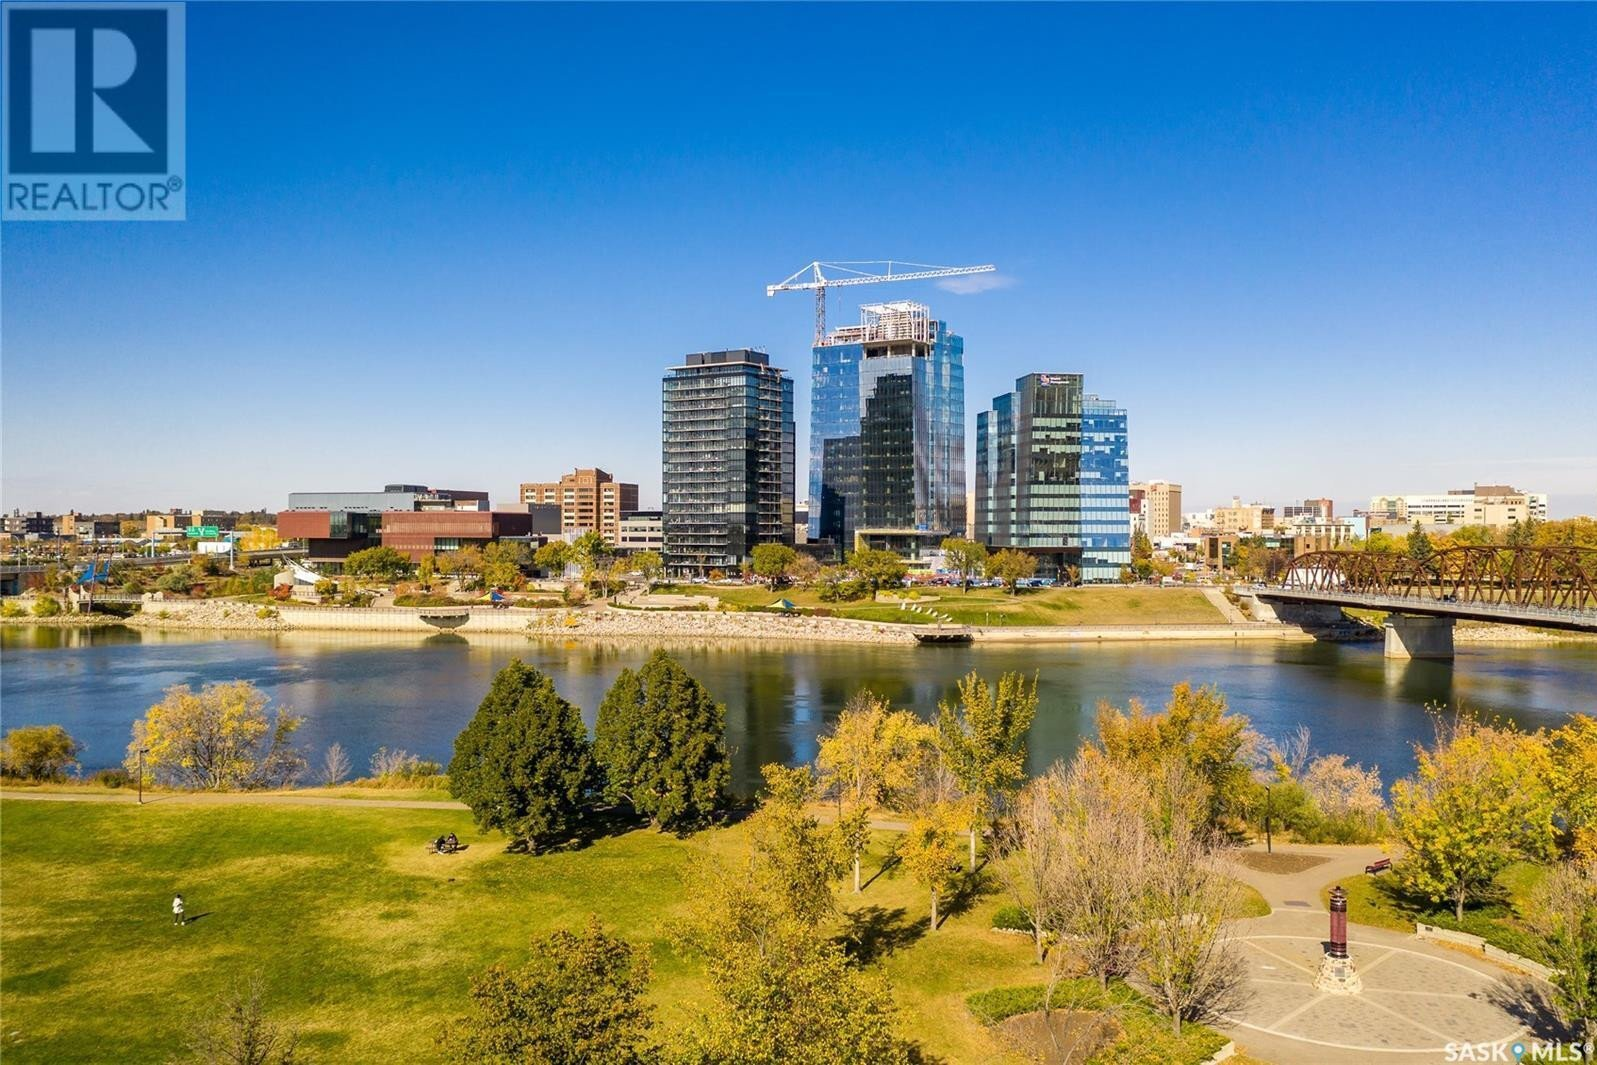 Home for sale at 316 Saskatchewan Cres E Saskatoon Saskatchewan - MLS: SK833128